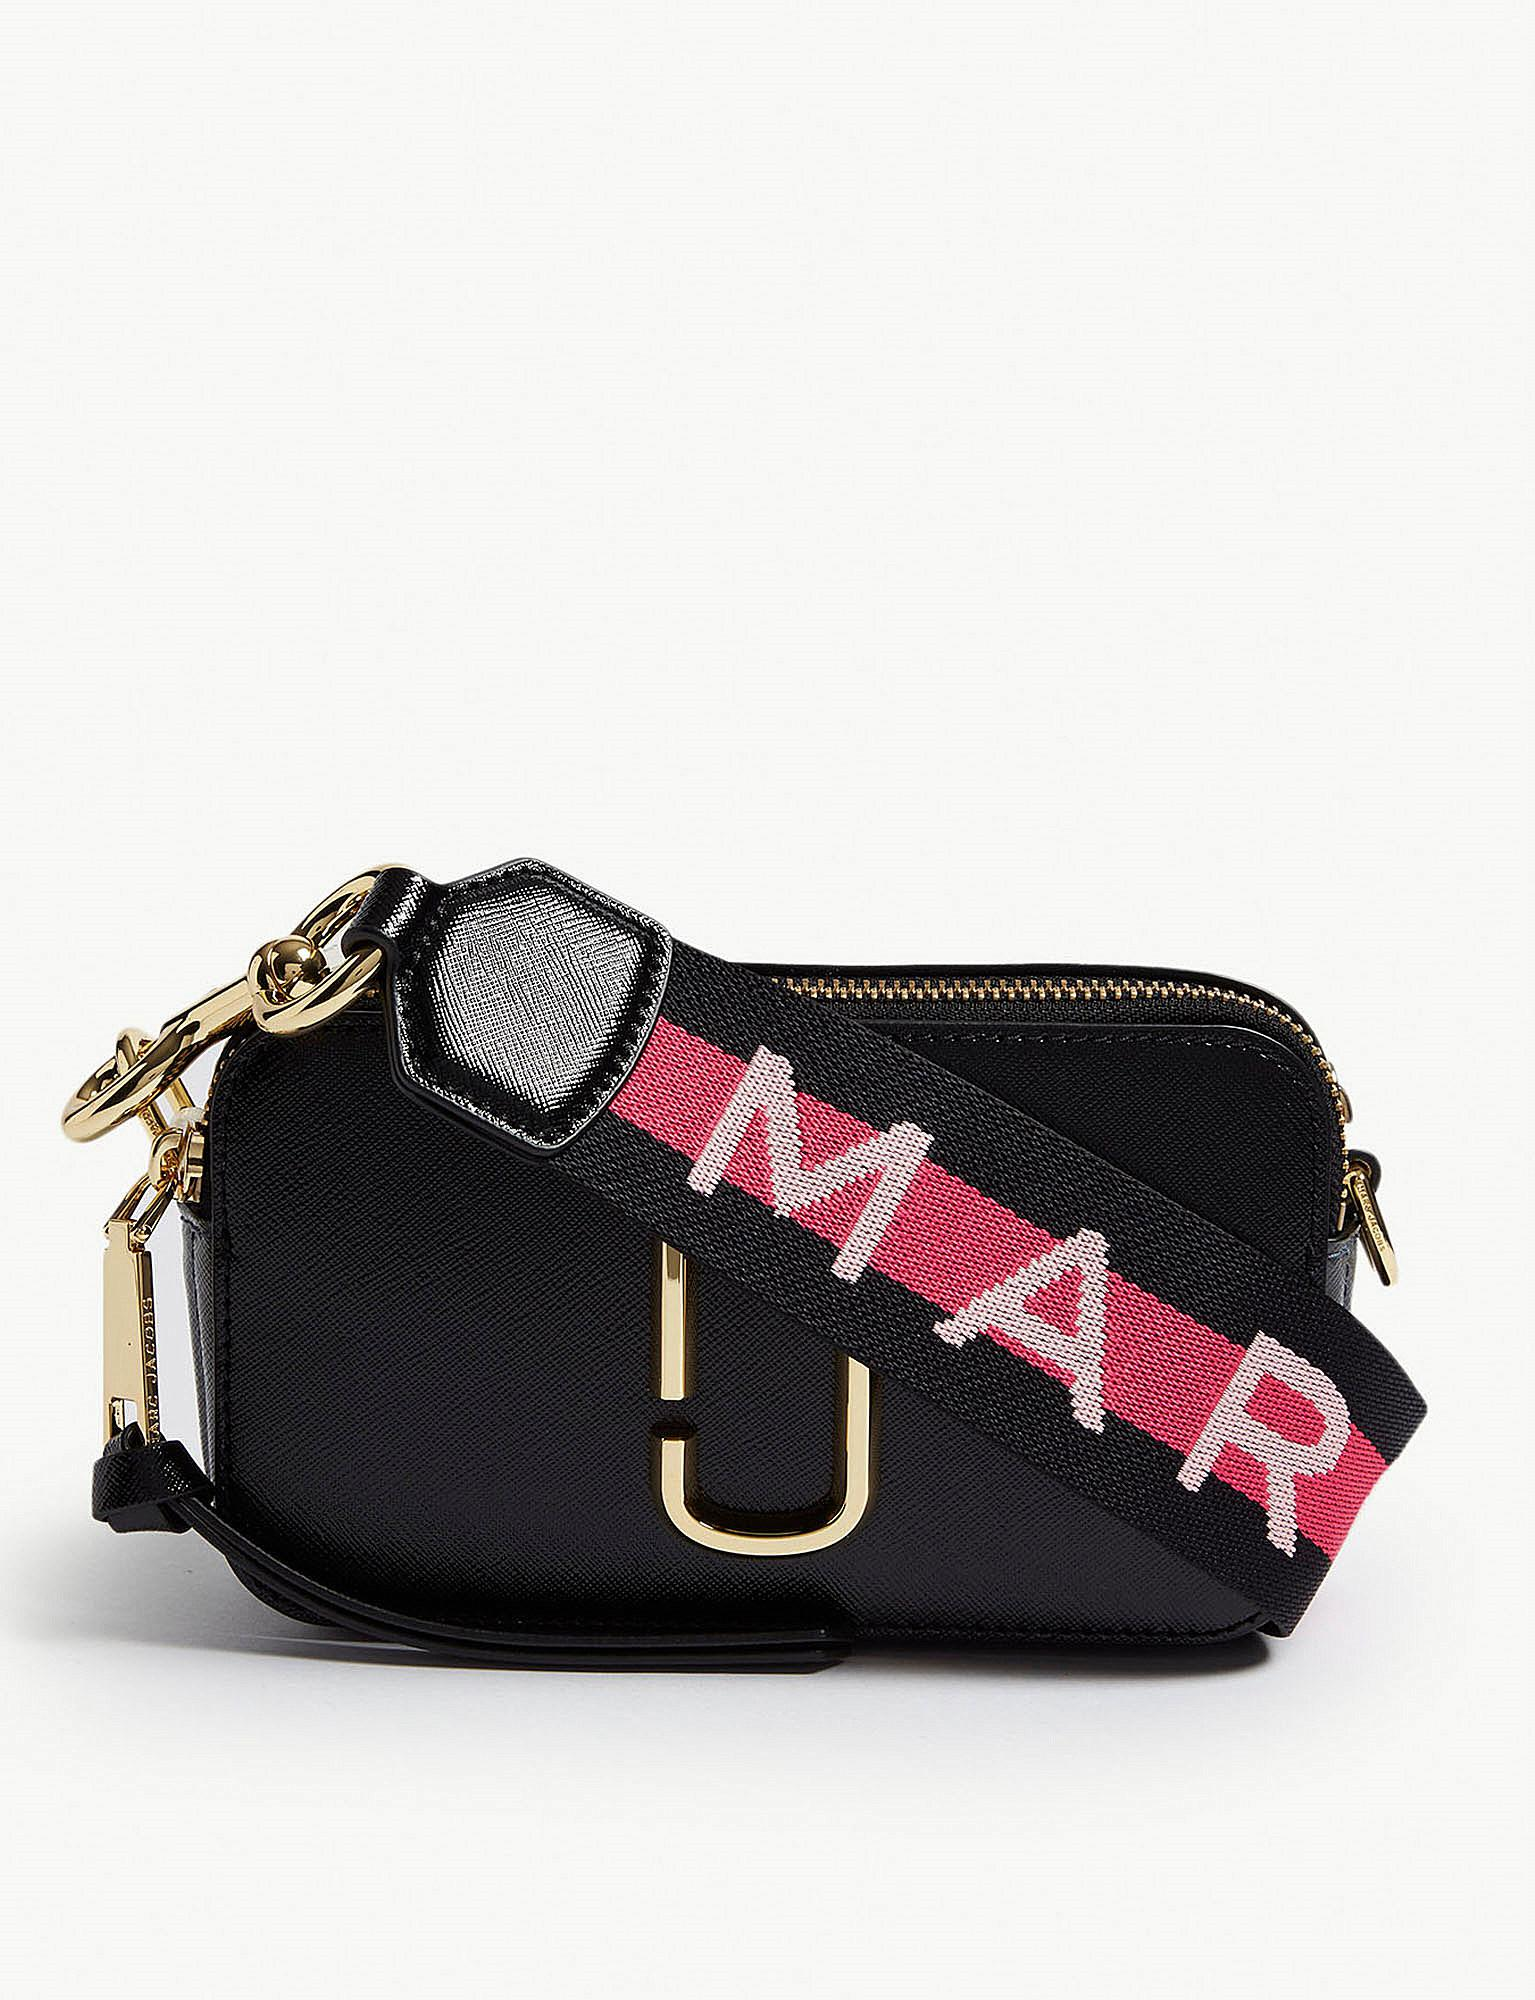 Marc Jacobs. Women s Ladies Black Snapshot Saffiano Leather Cross-body Bag 830ad3b34c436